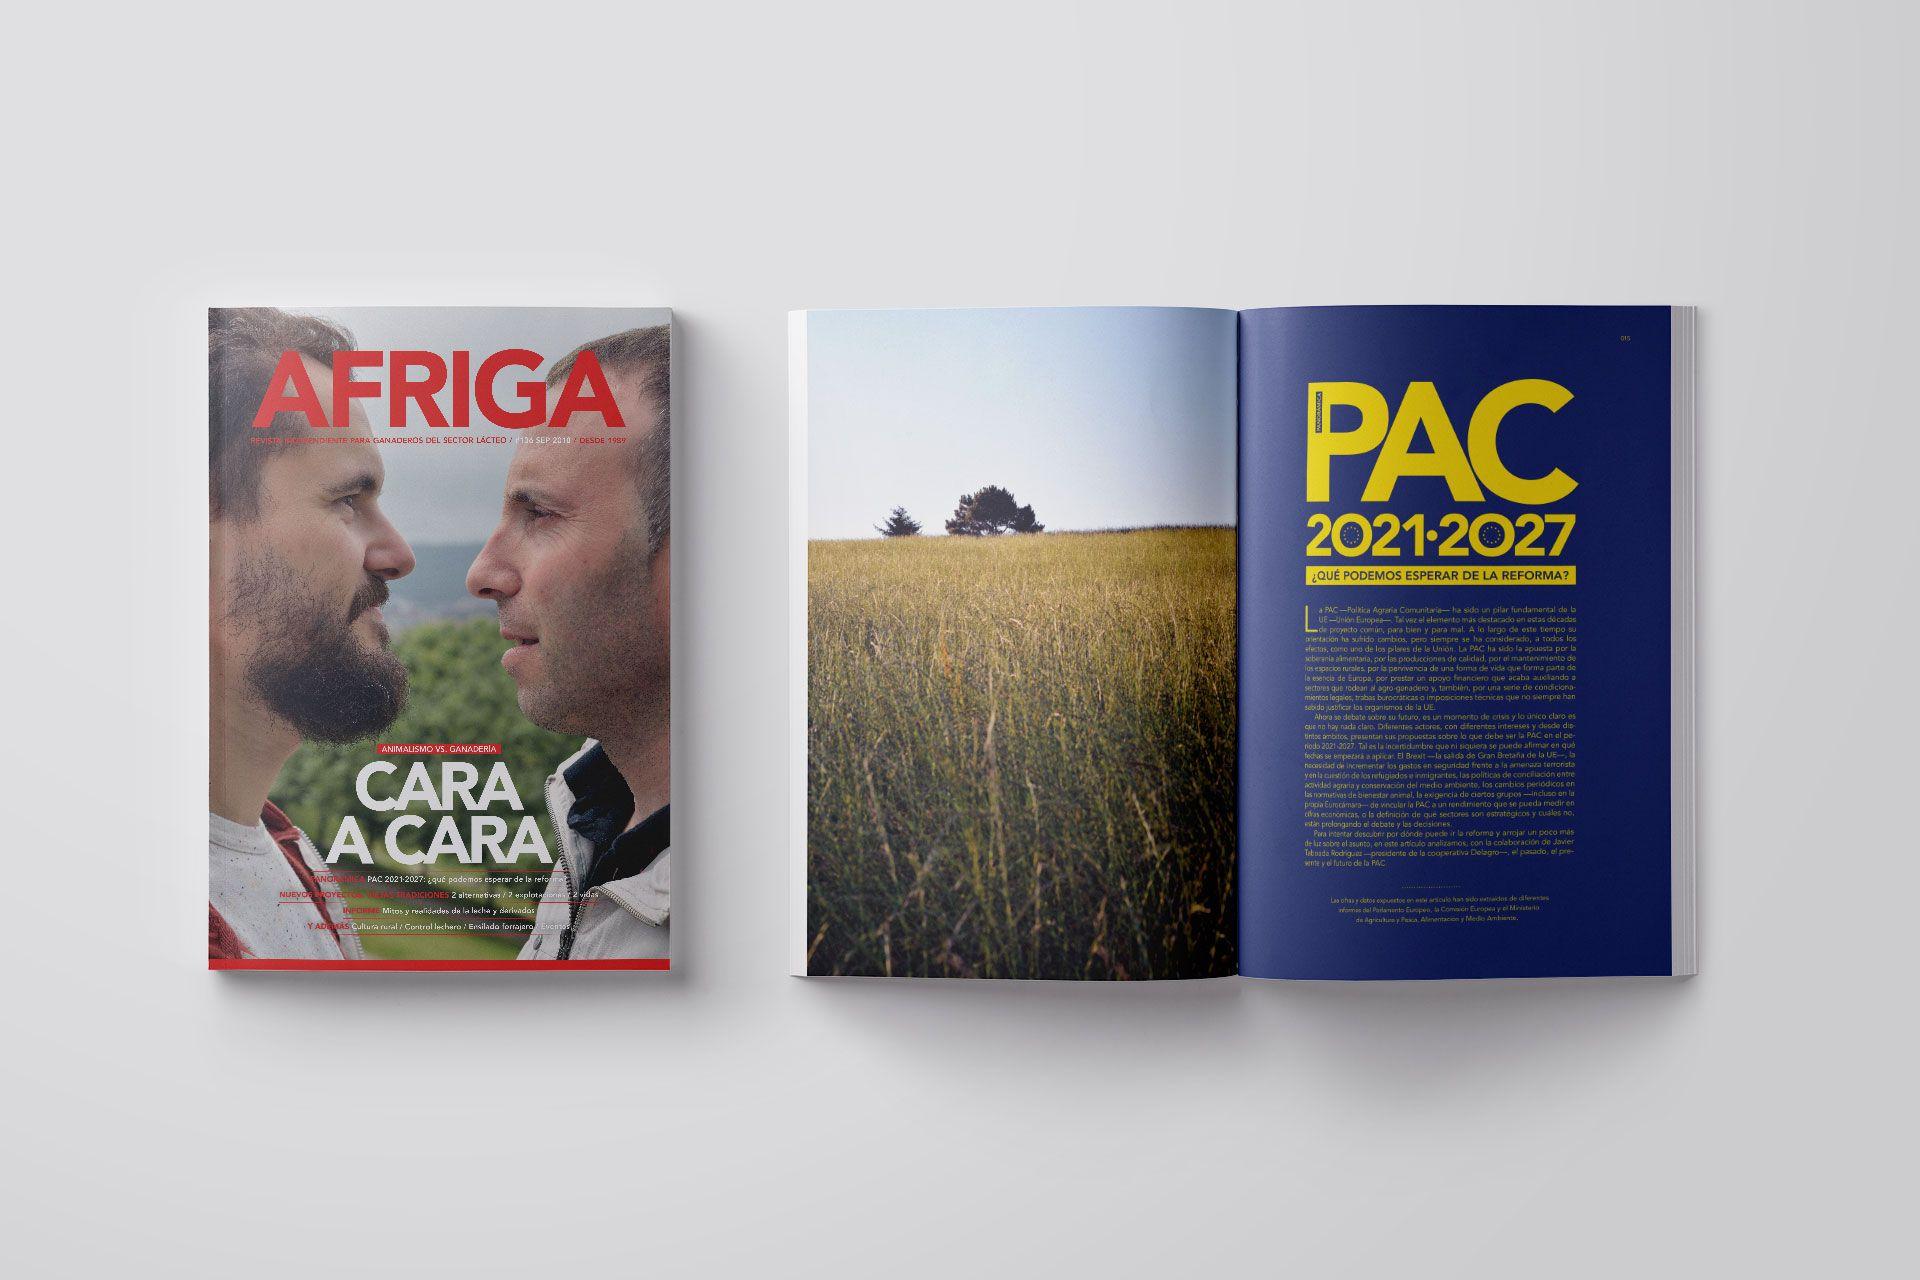 Revista AFRIGA #136 — Septiembre 2018 — Portada